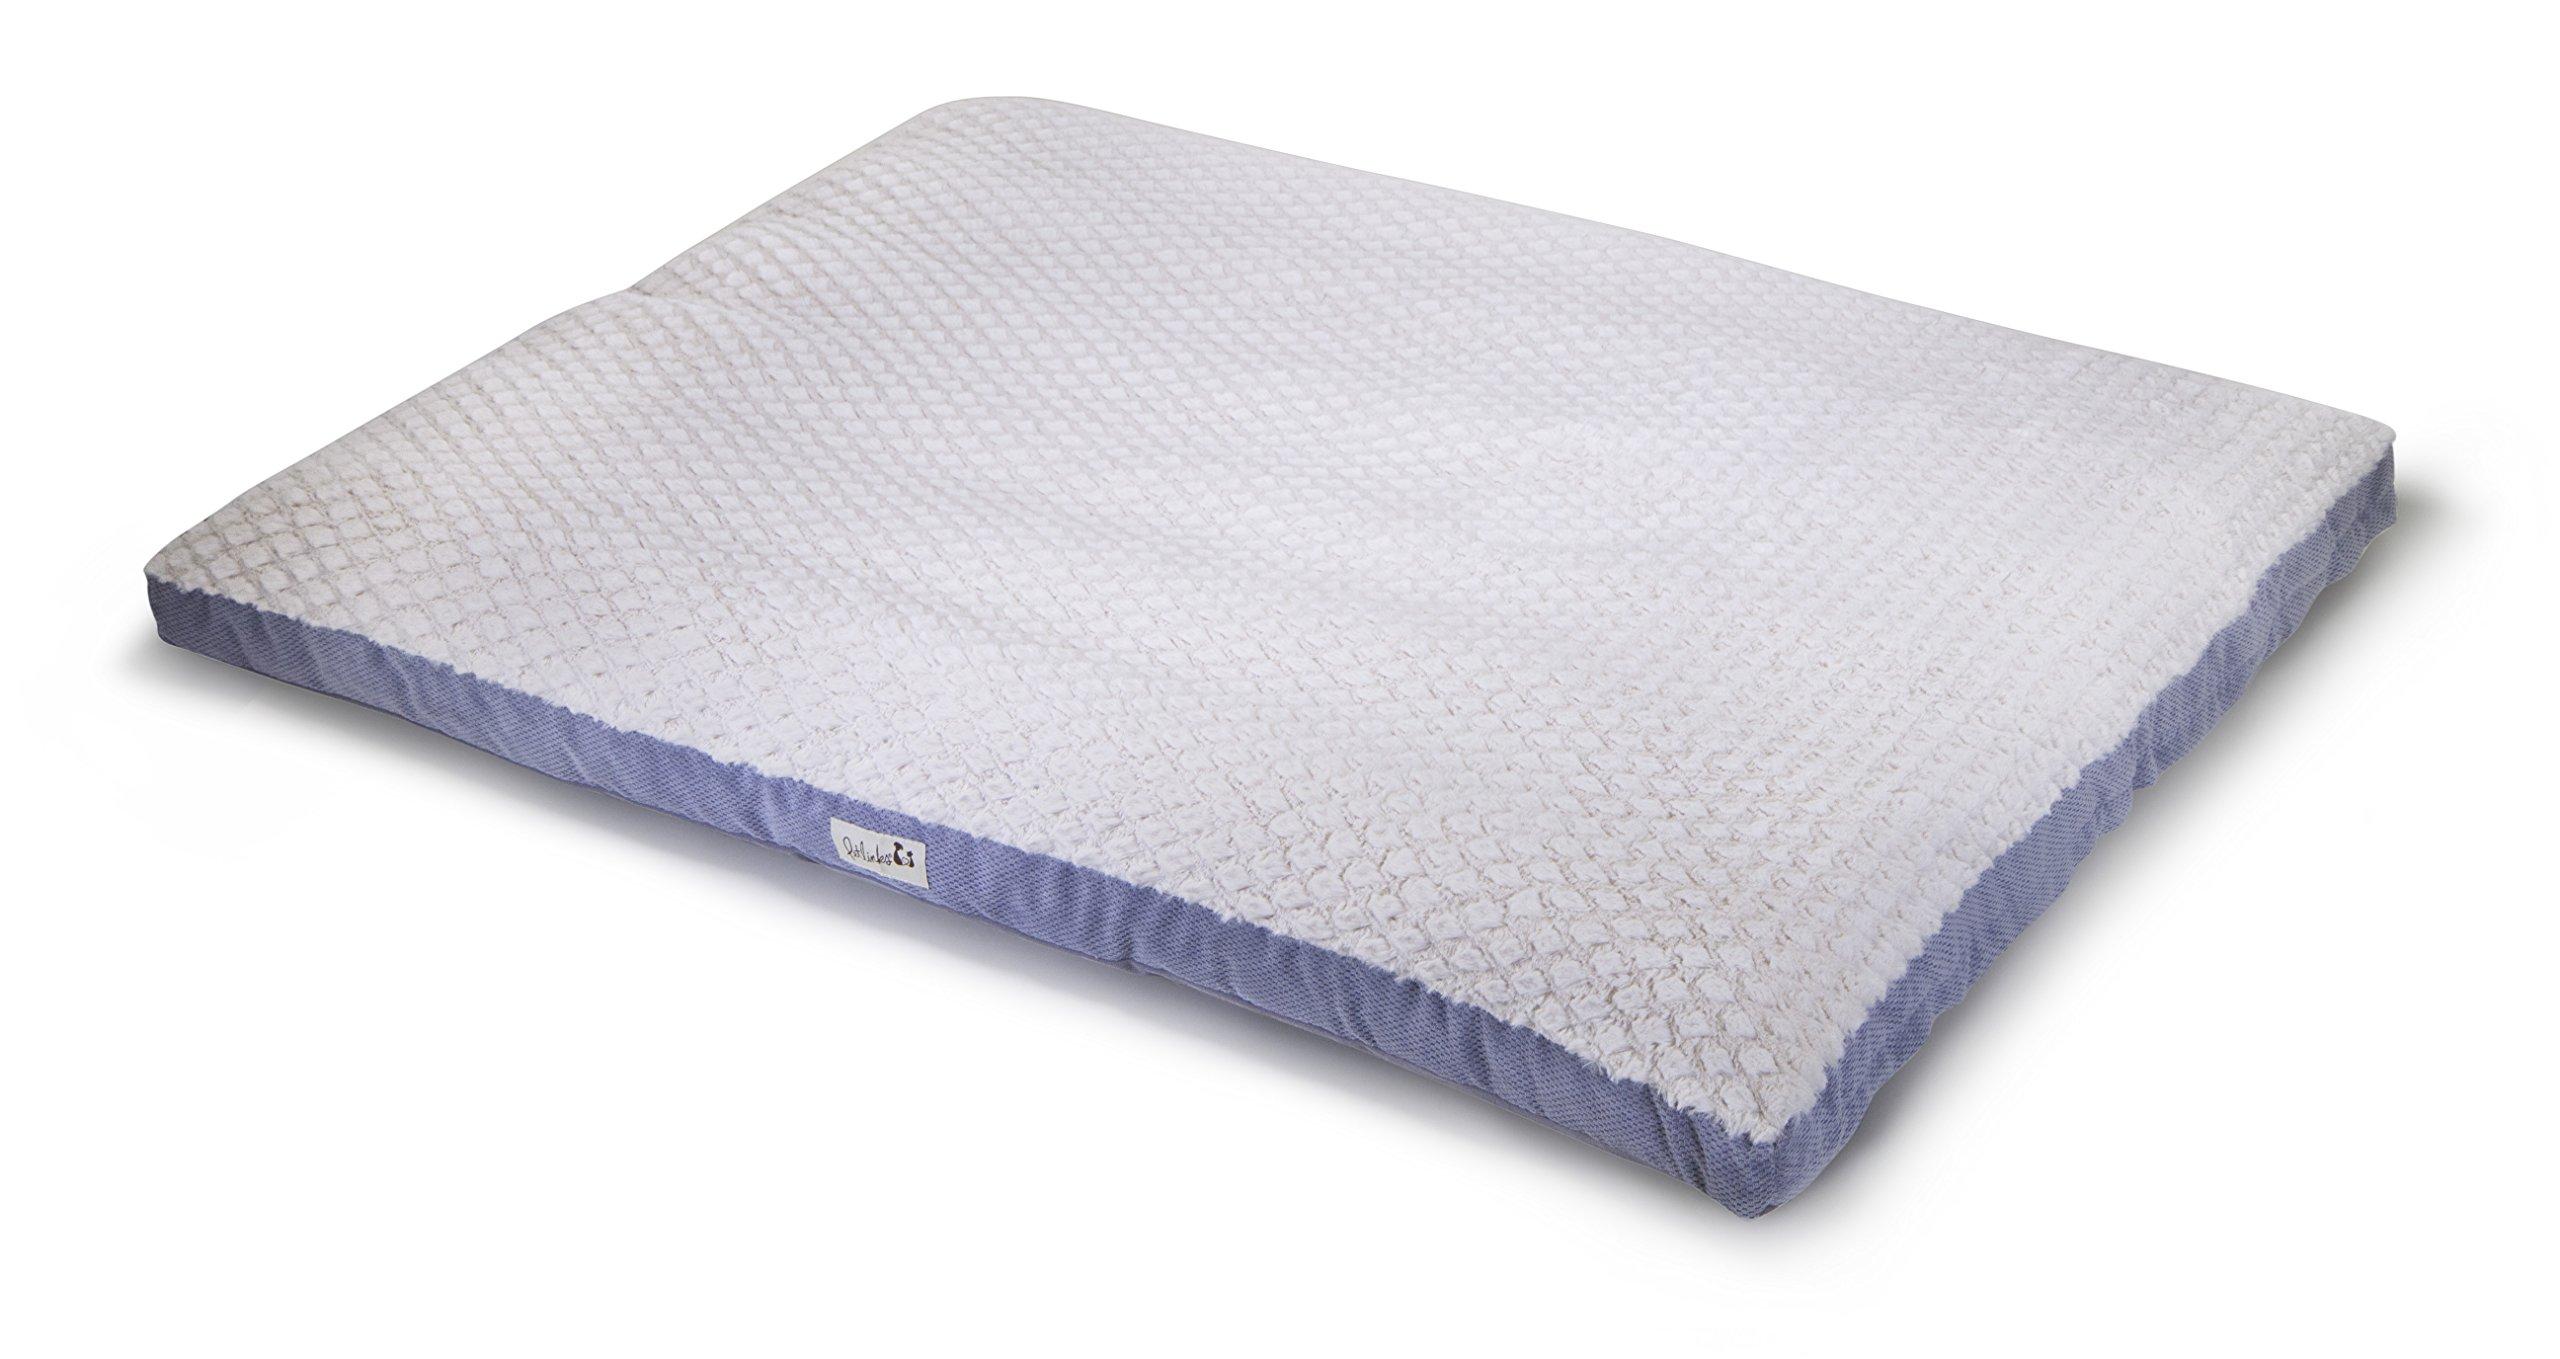 Petlinks Thera Max Memory Foam Pet Bed, Extra Large, Gray